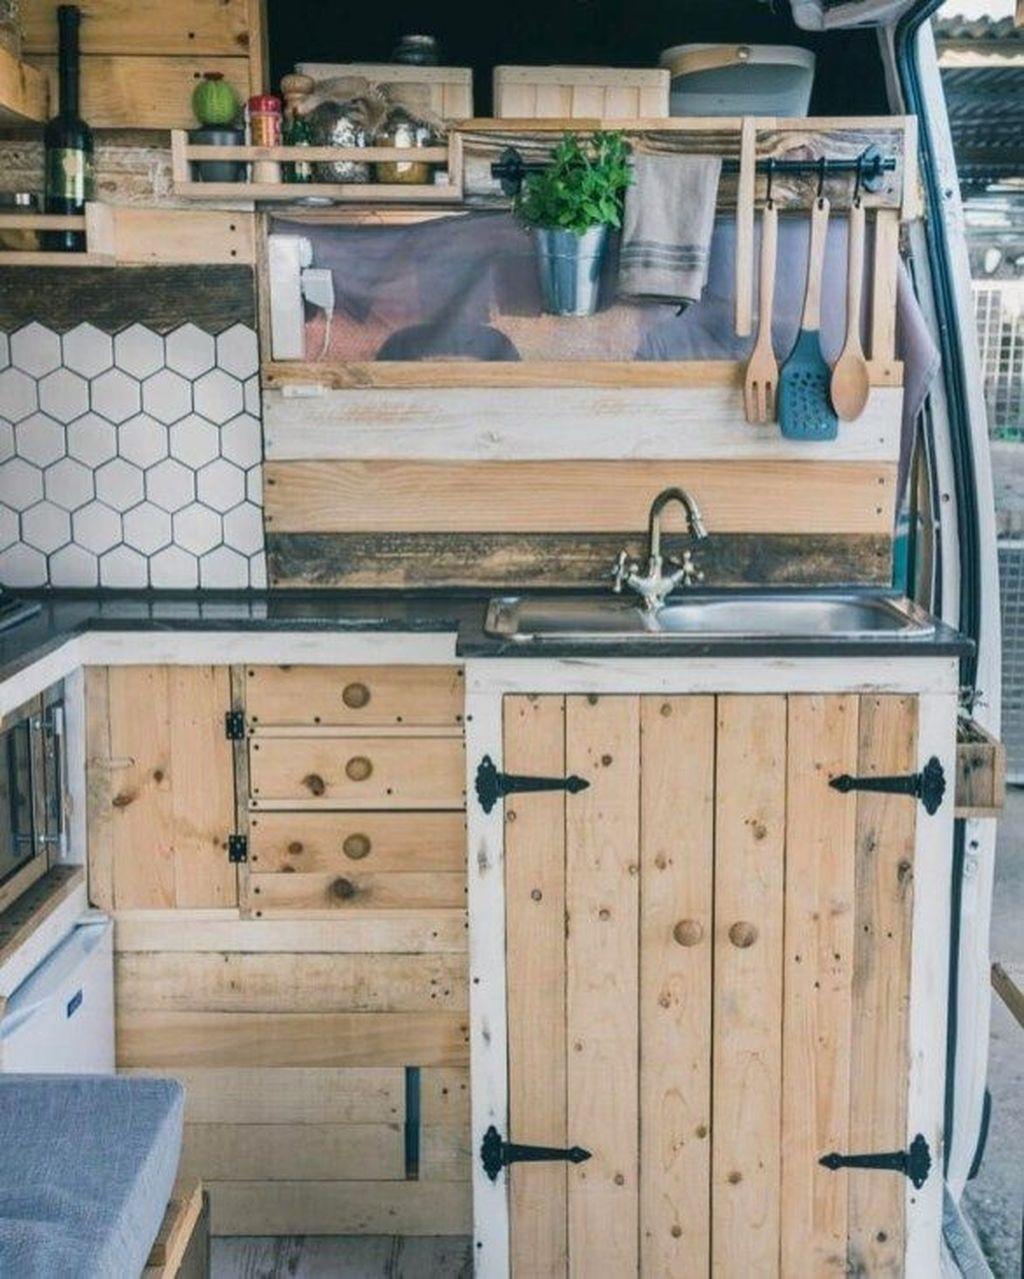 Inspiring RV Kitchen Design And Decor Ideas 20